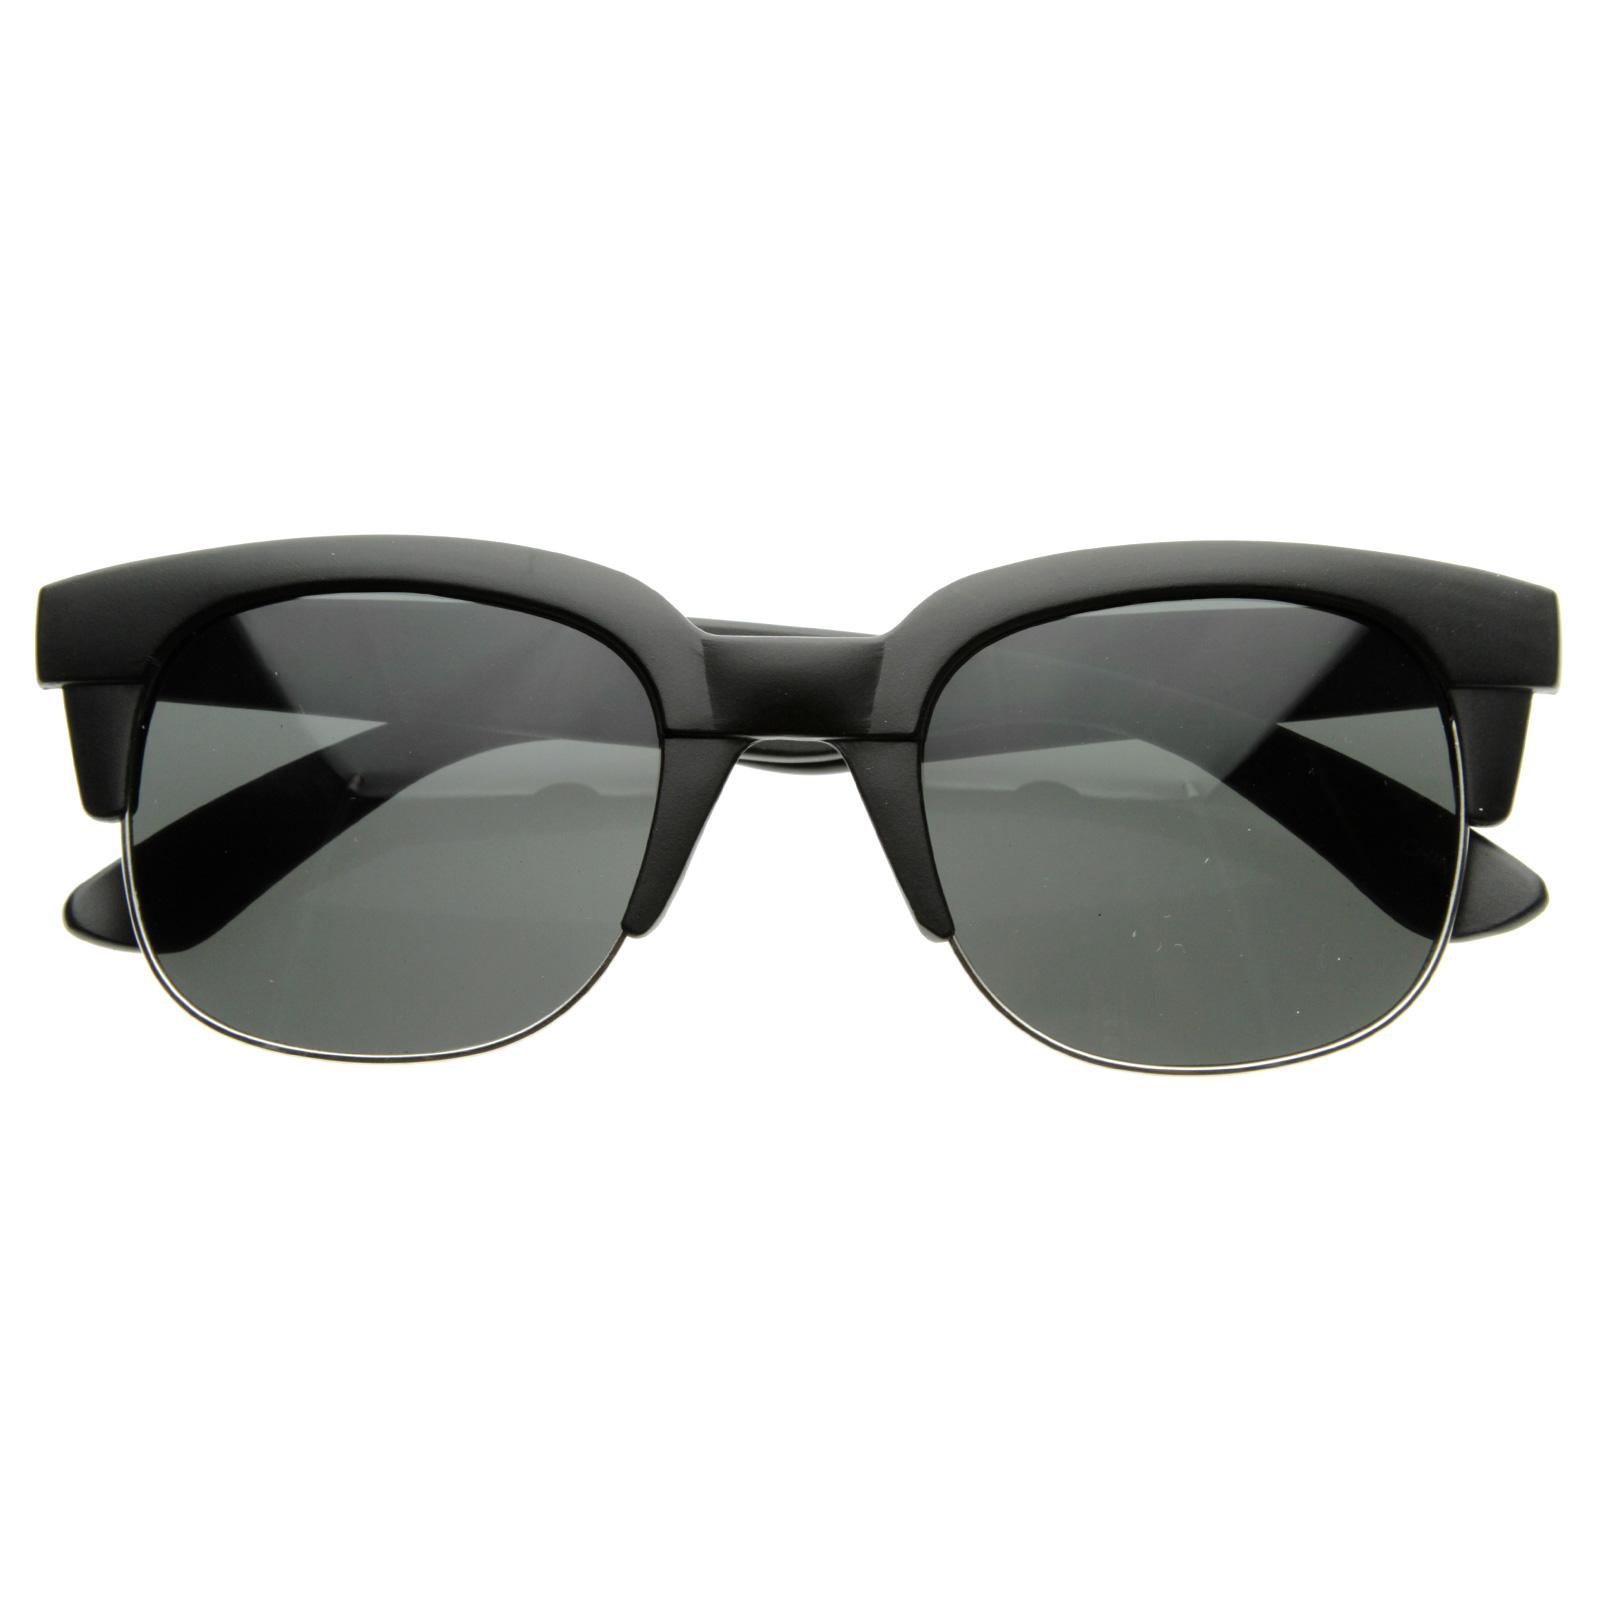 Half Frame Retro Glasses : Super Square Modern Fashion Half Frame Retro Horn Rimmed ...